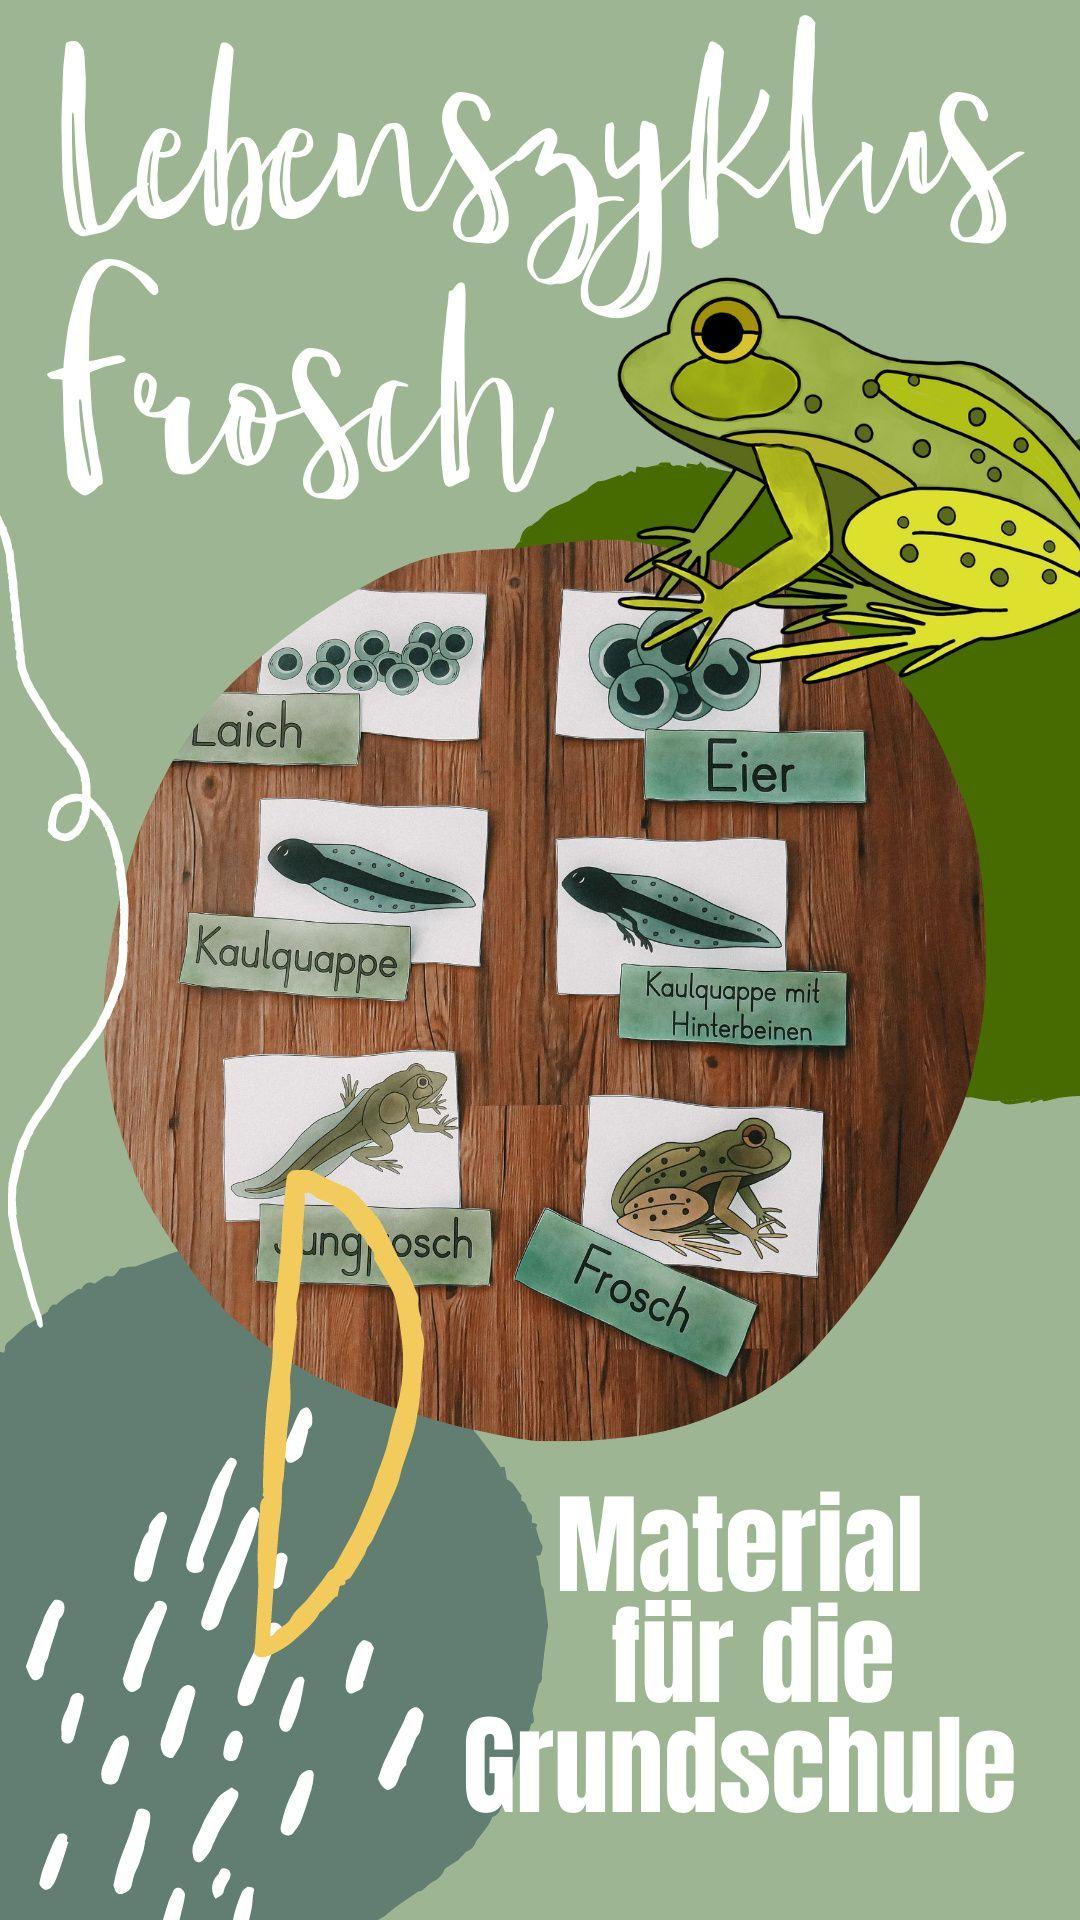 Lebenszyklus Frosch Tafelmaterial mit Bildkarten & Textkarten ...